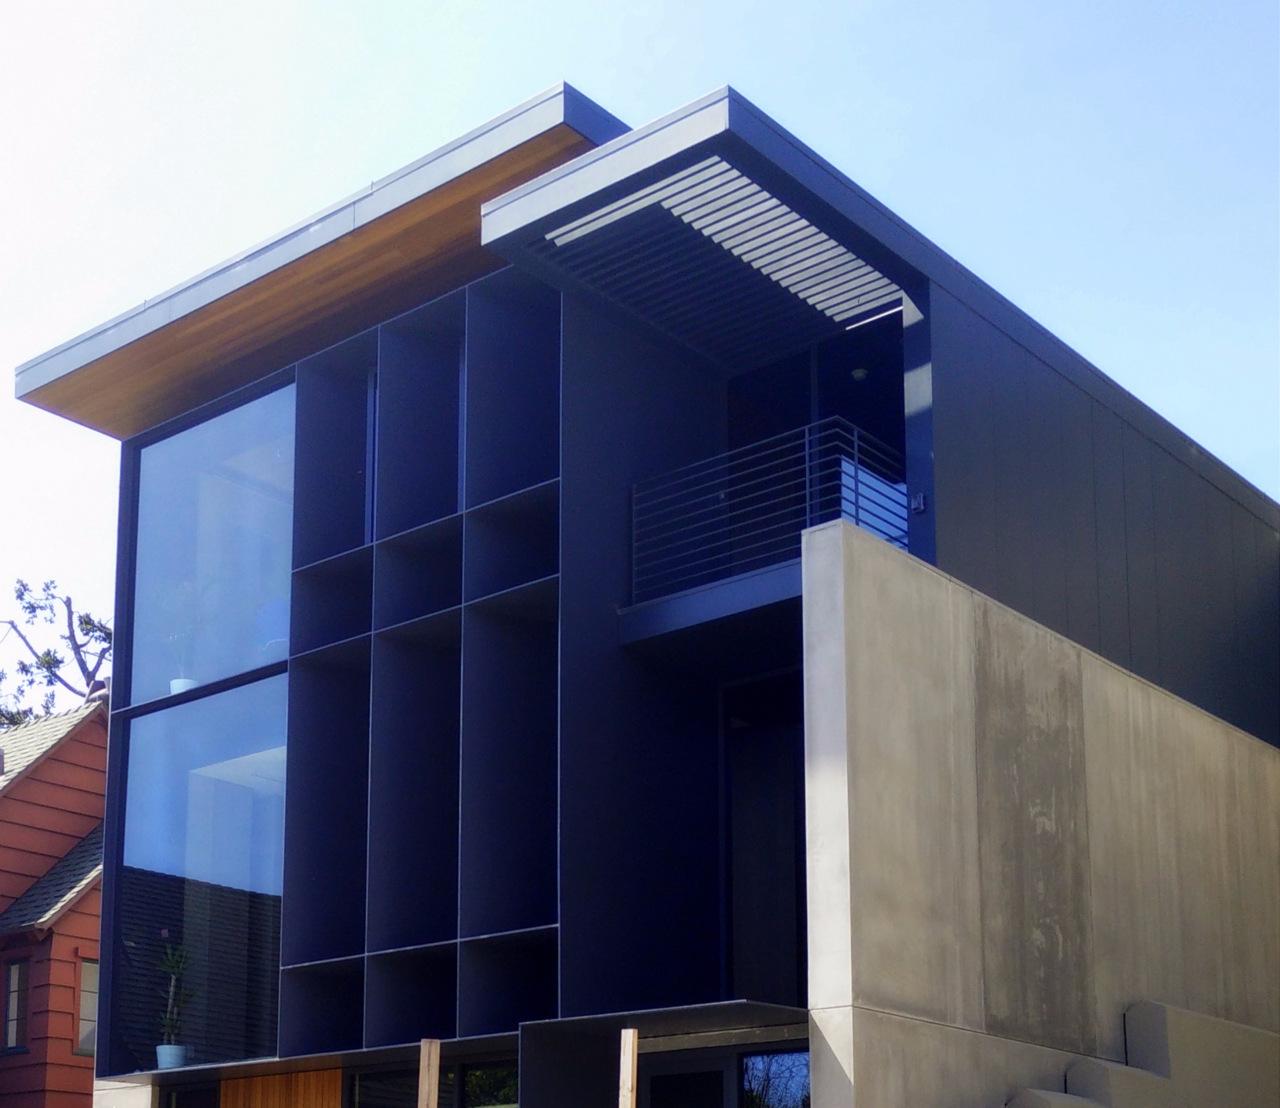 California, 2017, III - architecture - voiceofsf   ello